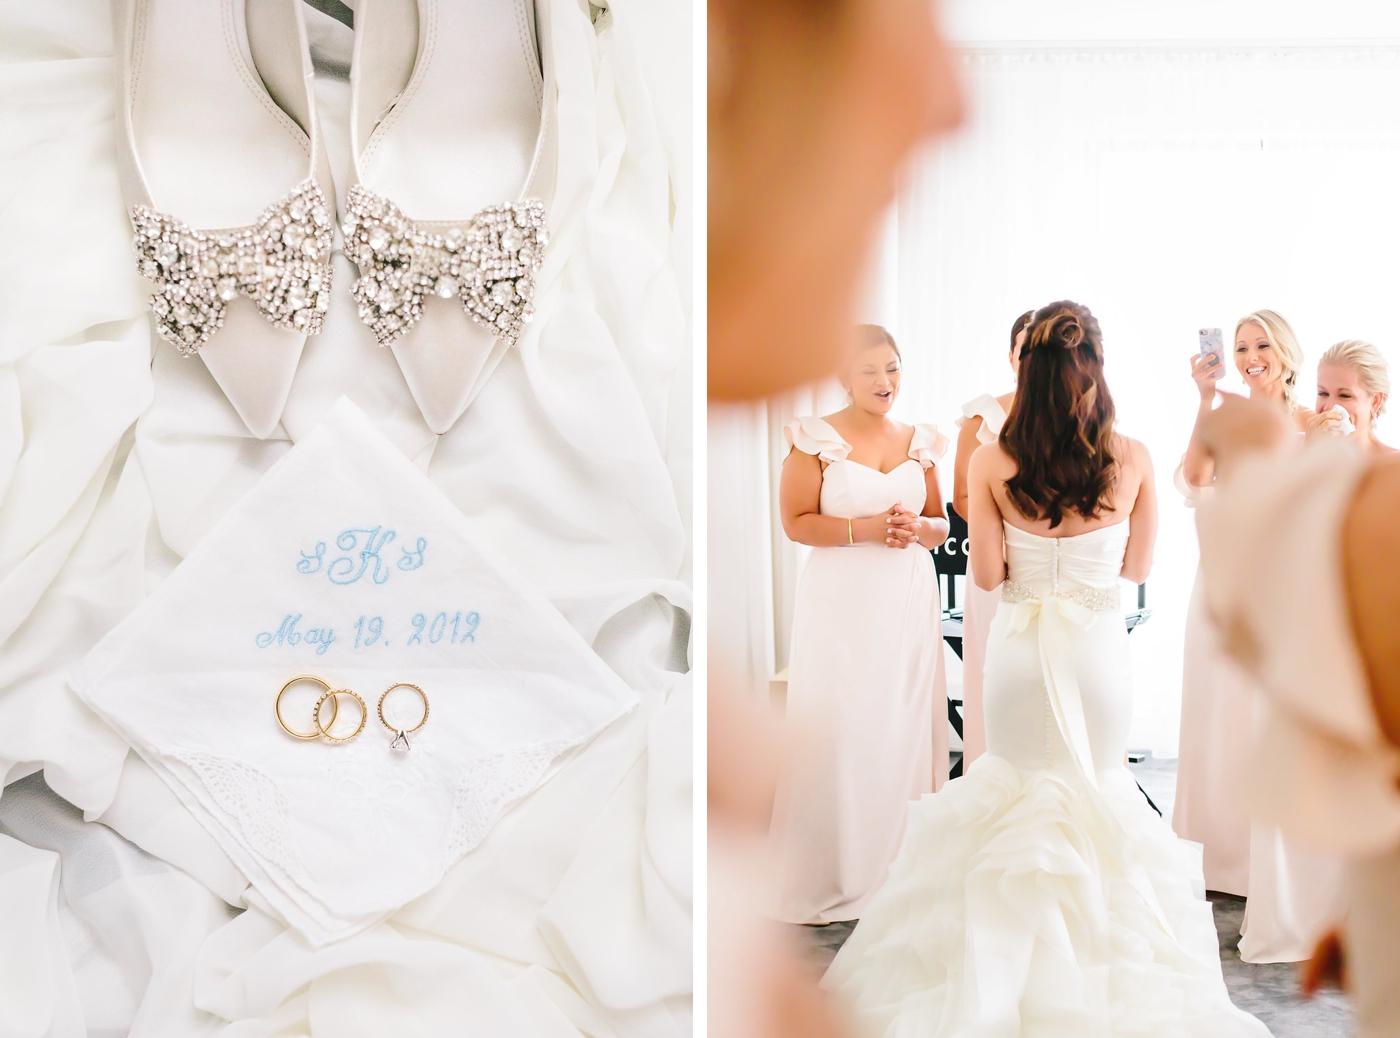 chicago-fine-art-wedding-photography-sakamuri13